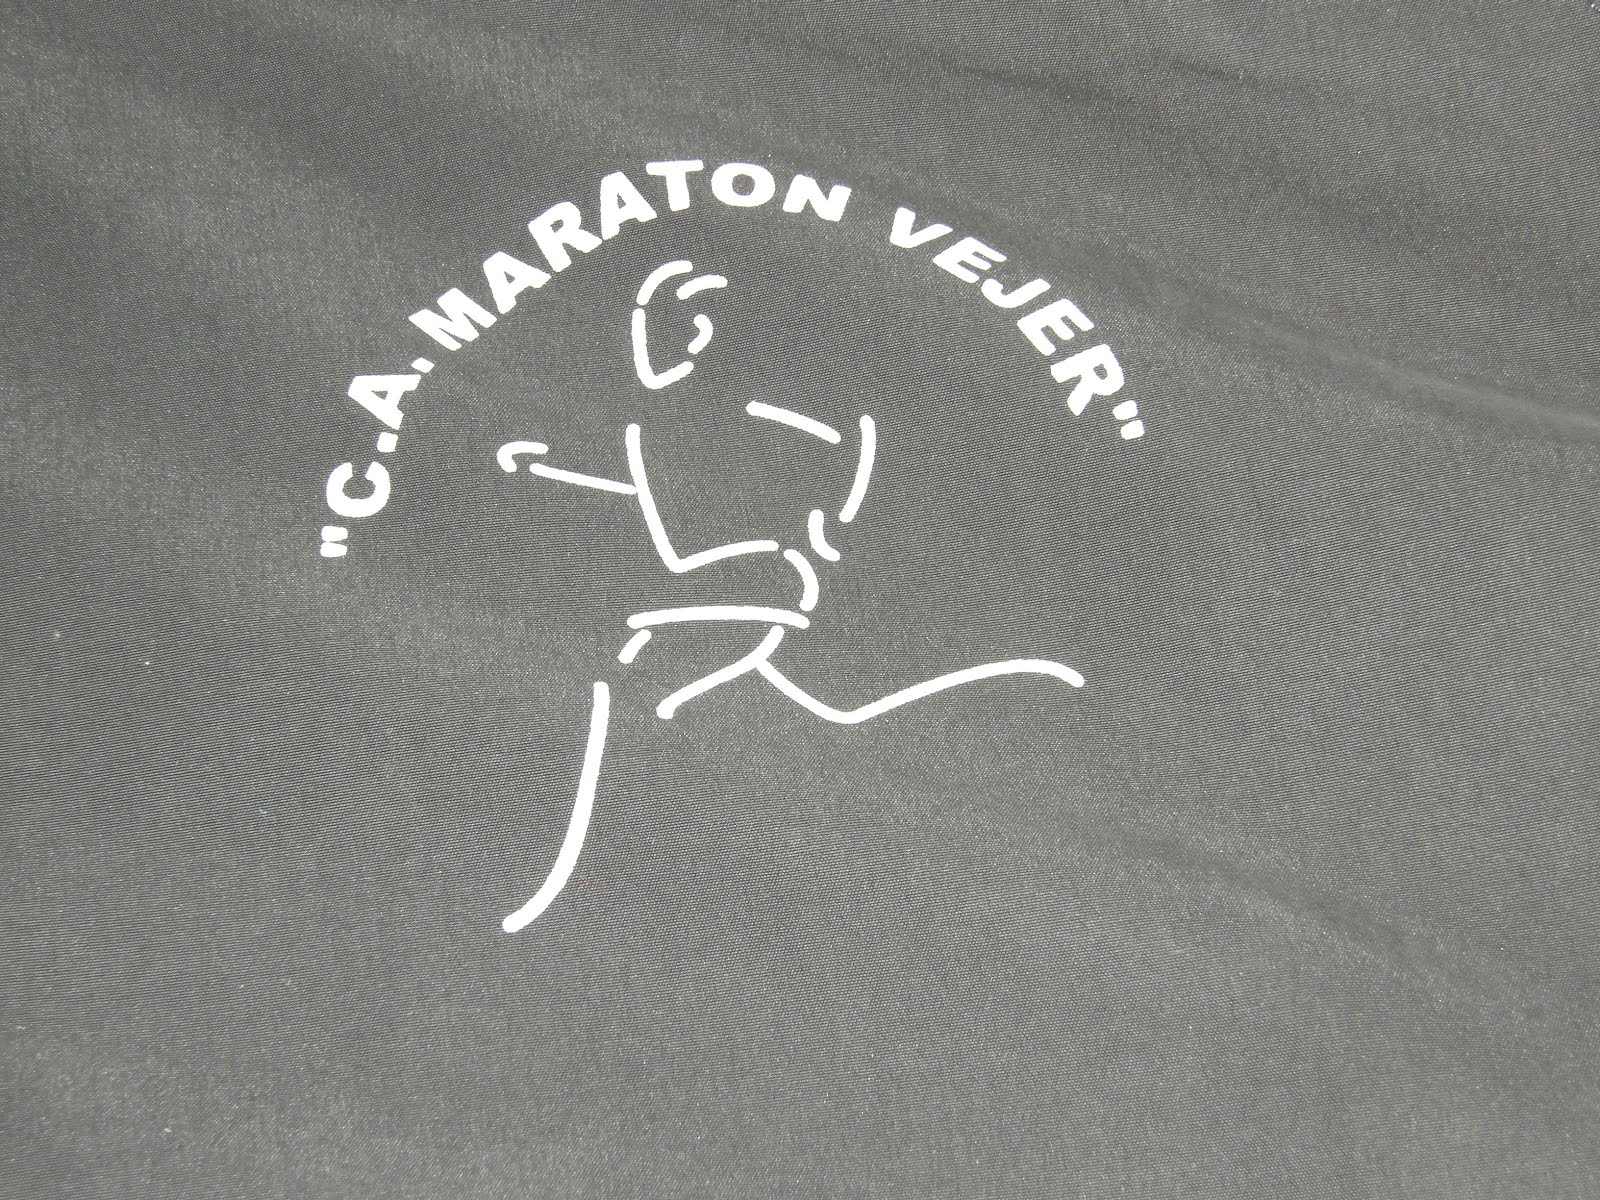 club atletismo maraton vejer